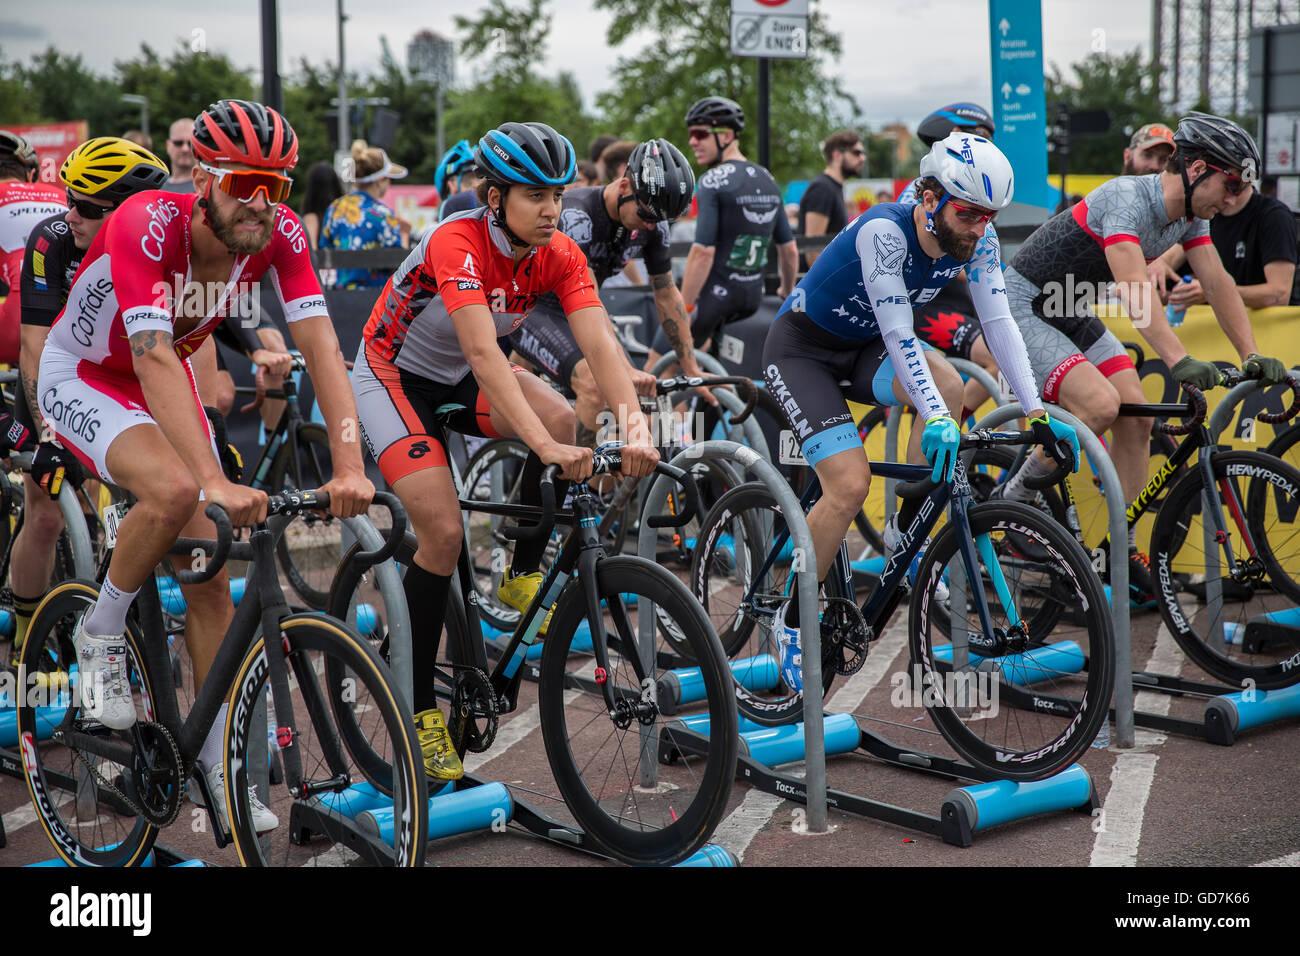 Red Hook Crit London 2016 Cycling Criterium Fixed Gear Bike